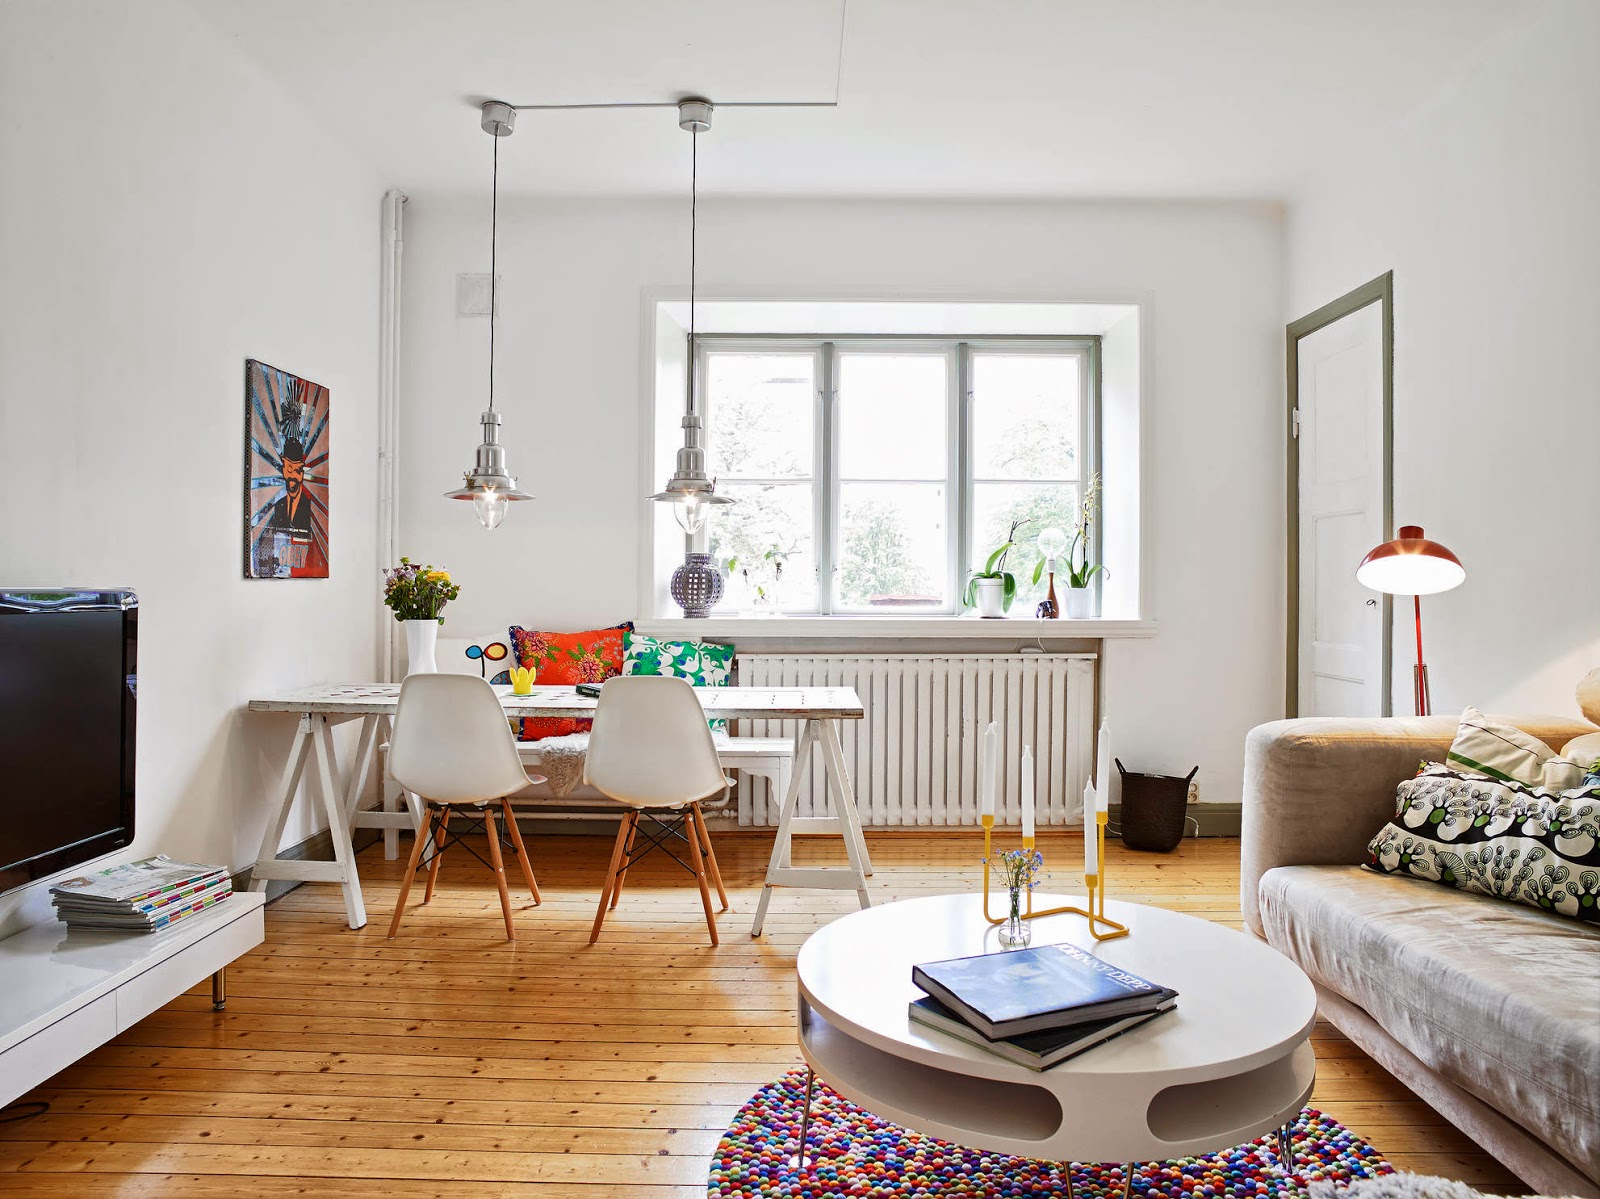 Diseu00f1o de Interiores u0026 Arquitectura: Apartamento de dos plantas con ...